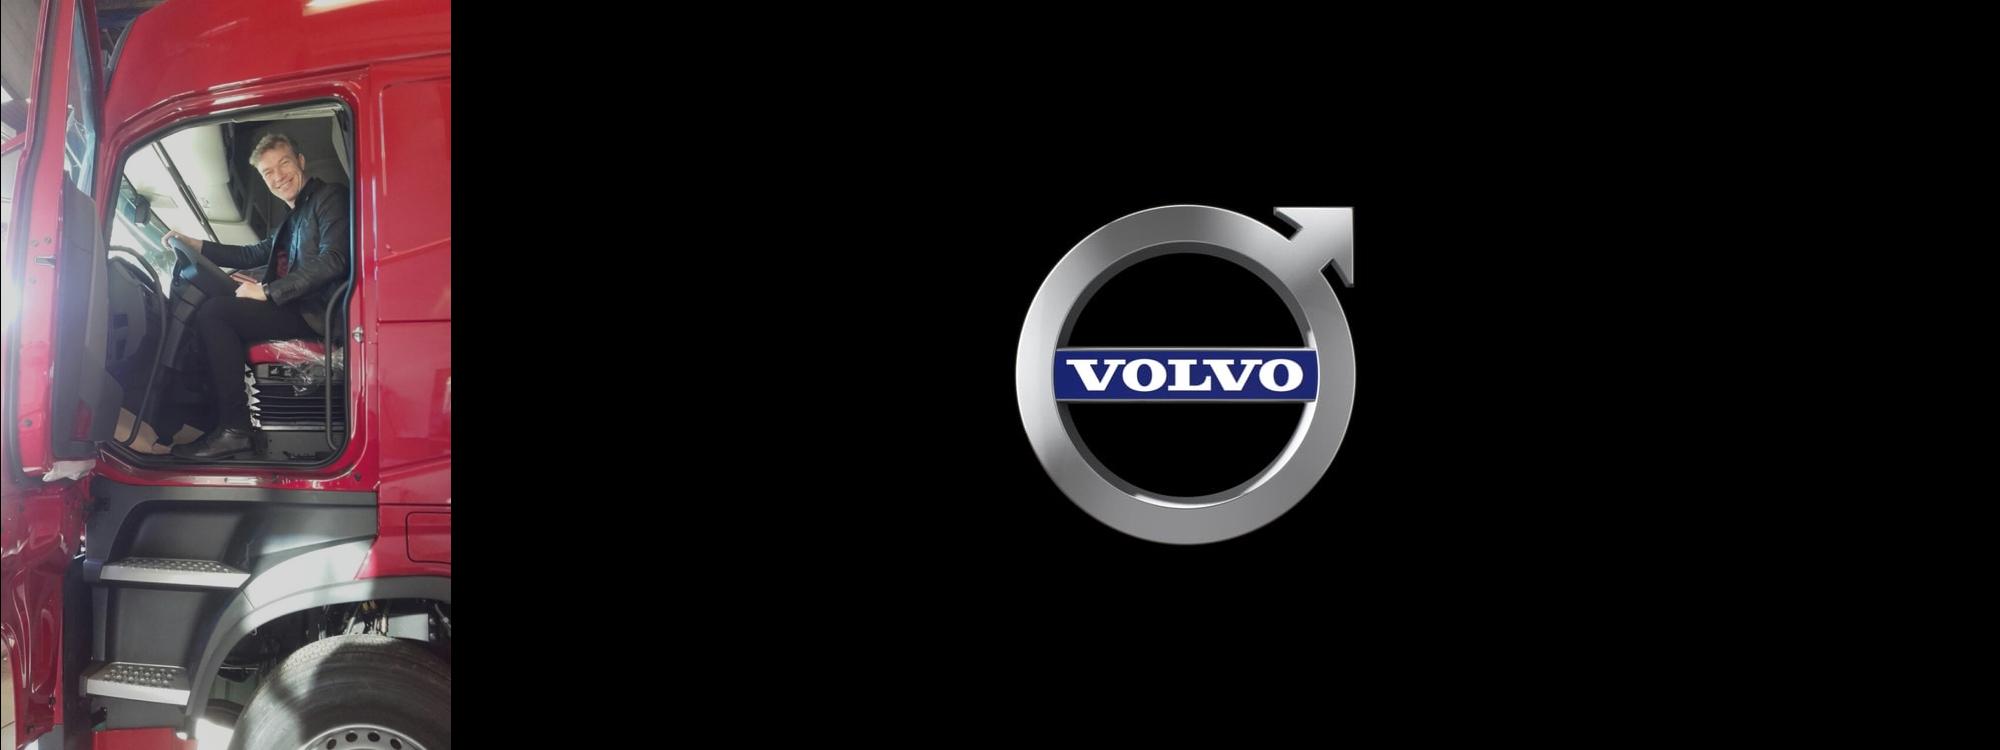 Jerôme in Volvo truck.001